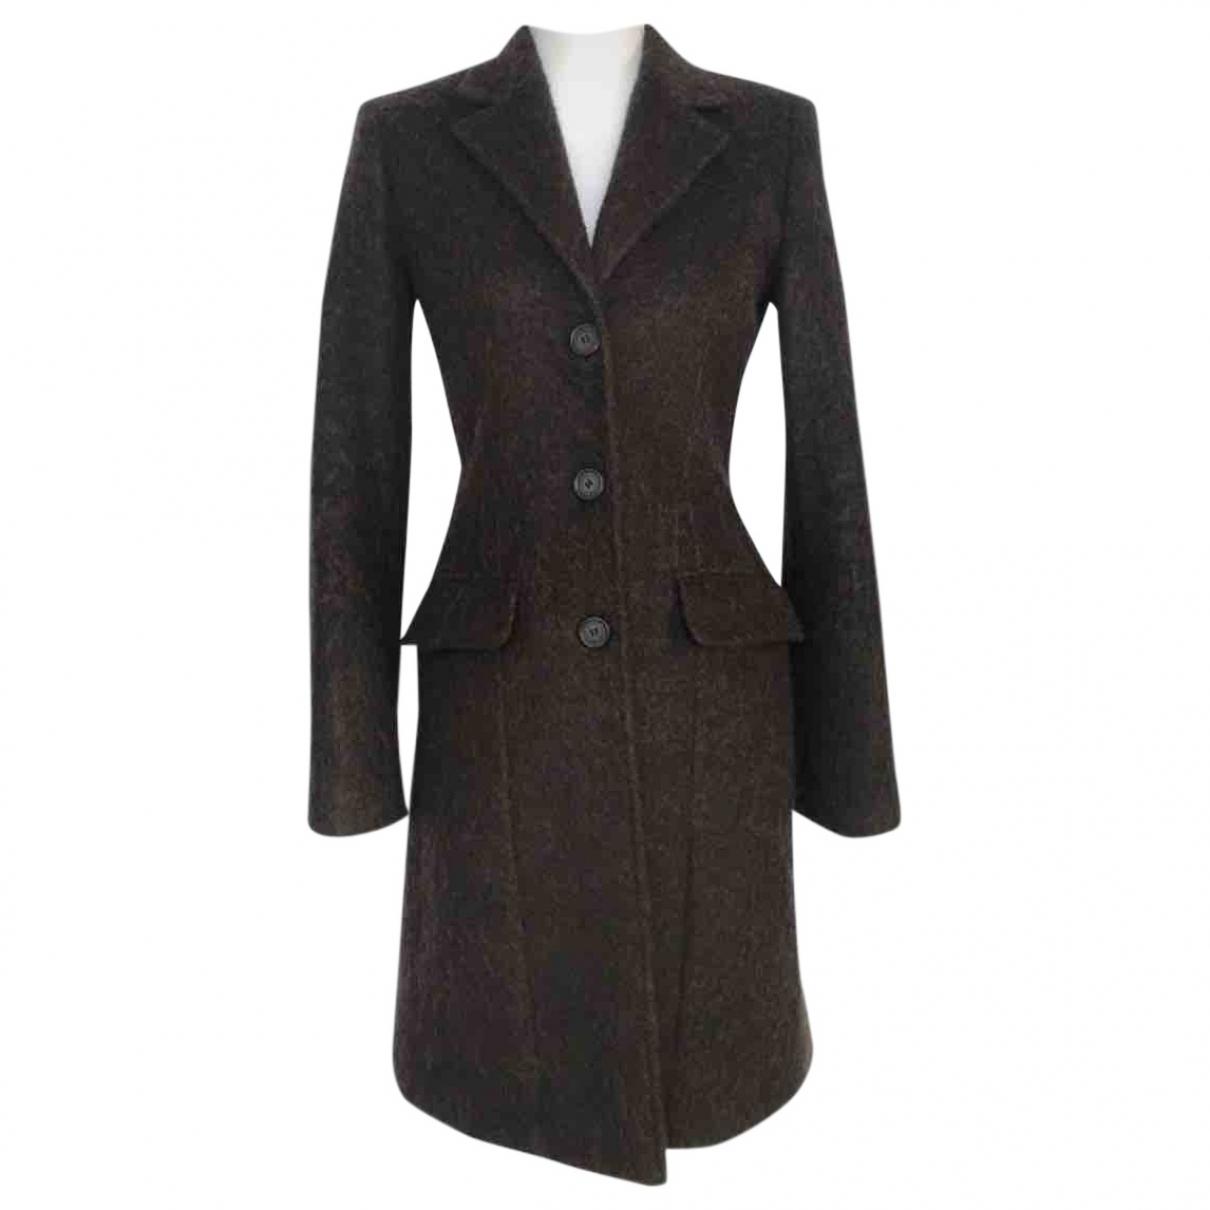 Gianfranco Ferré \N Black coat for Women XS International